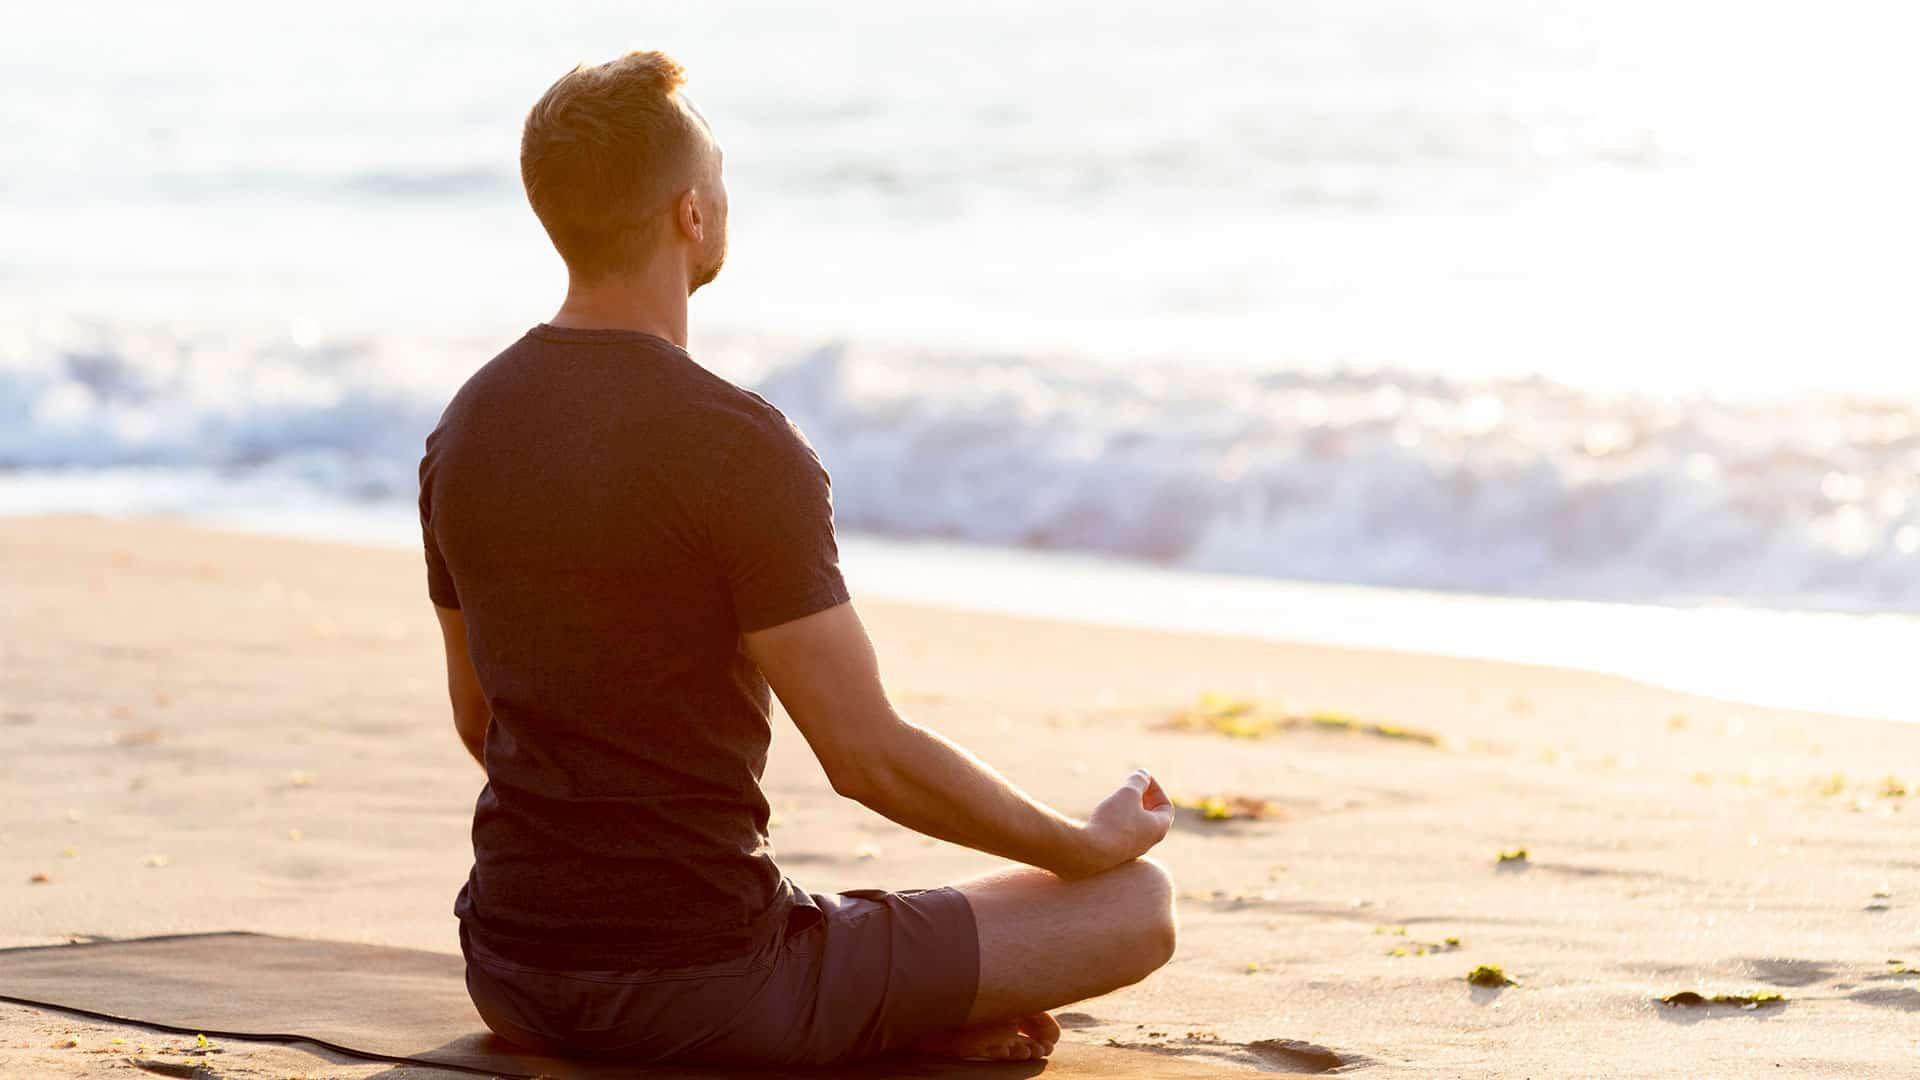 man-meditating-on-beach